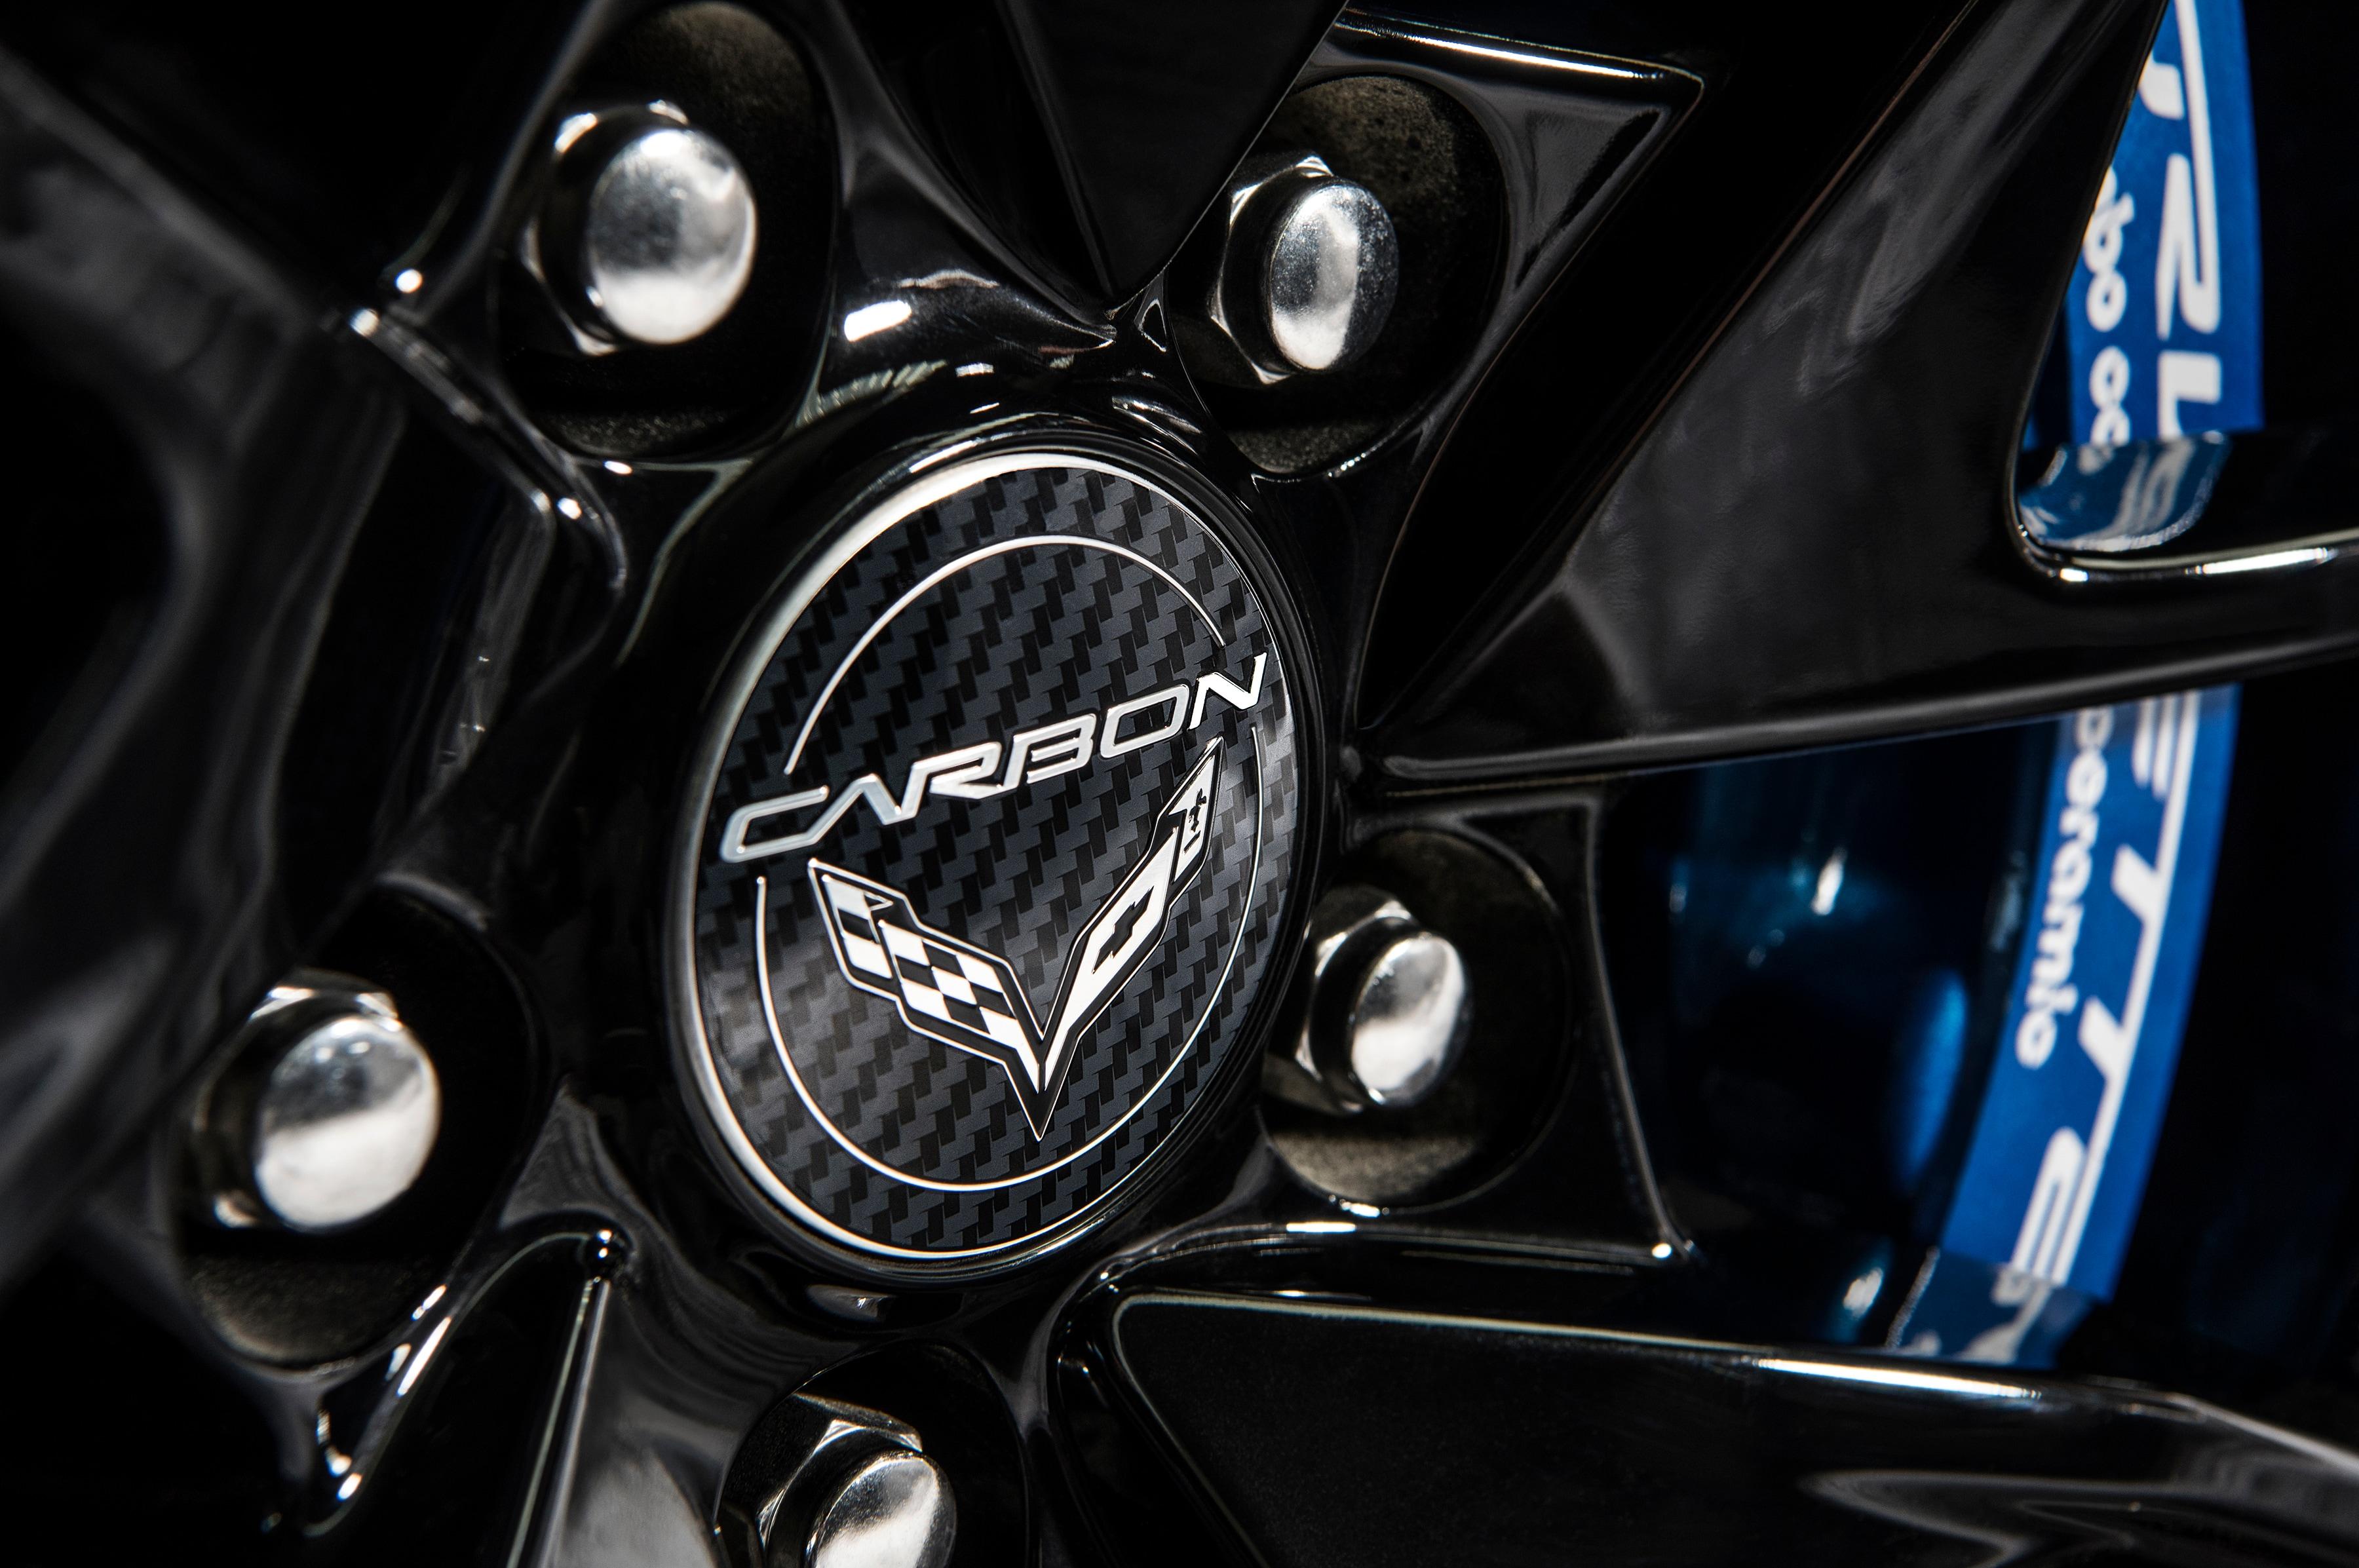 2018 Corvette Carbon 65 hood decal